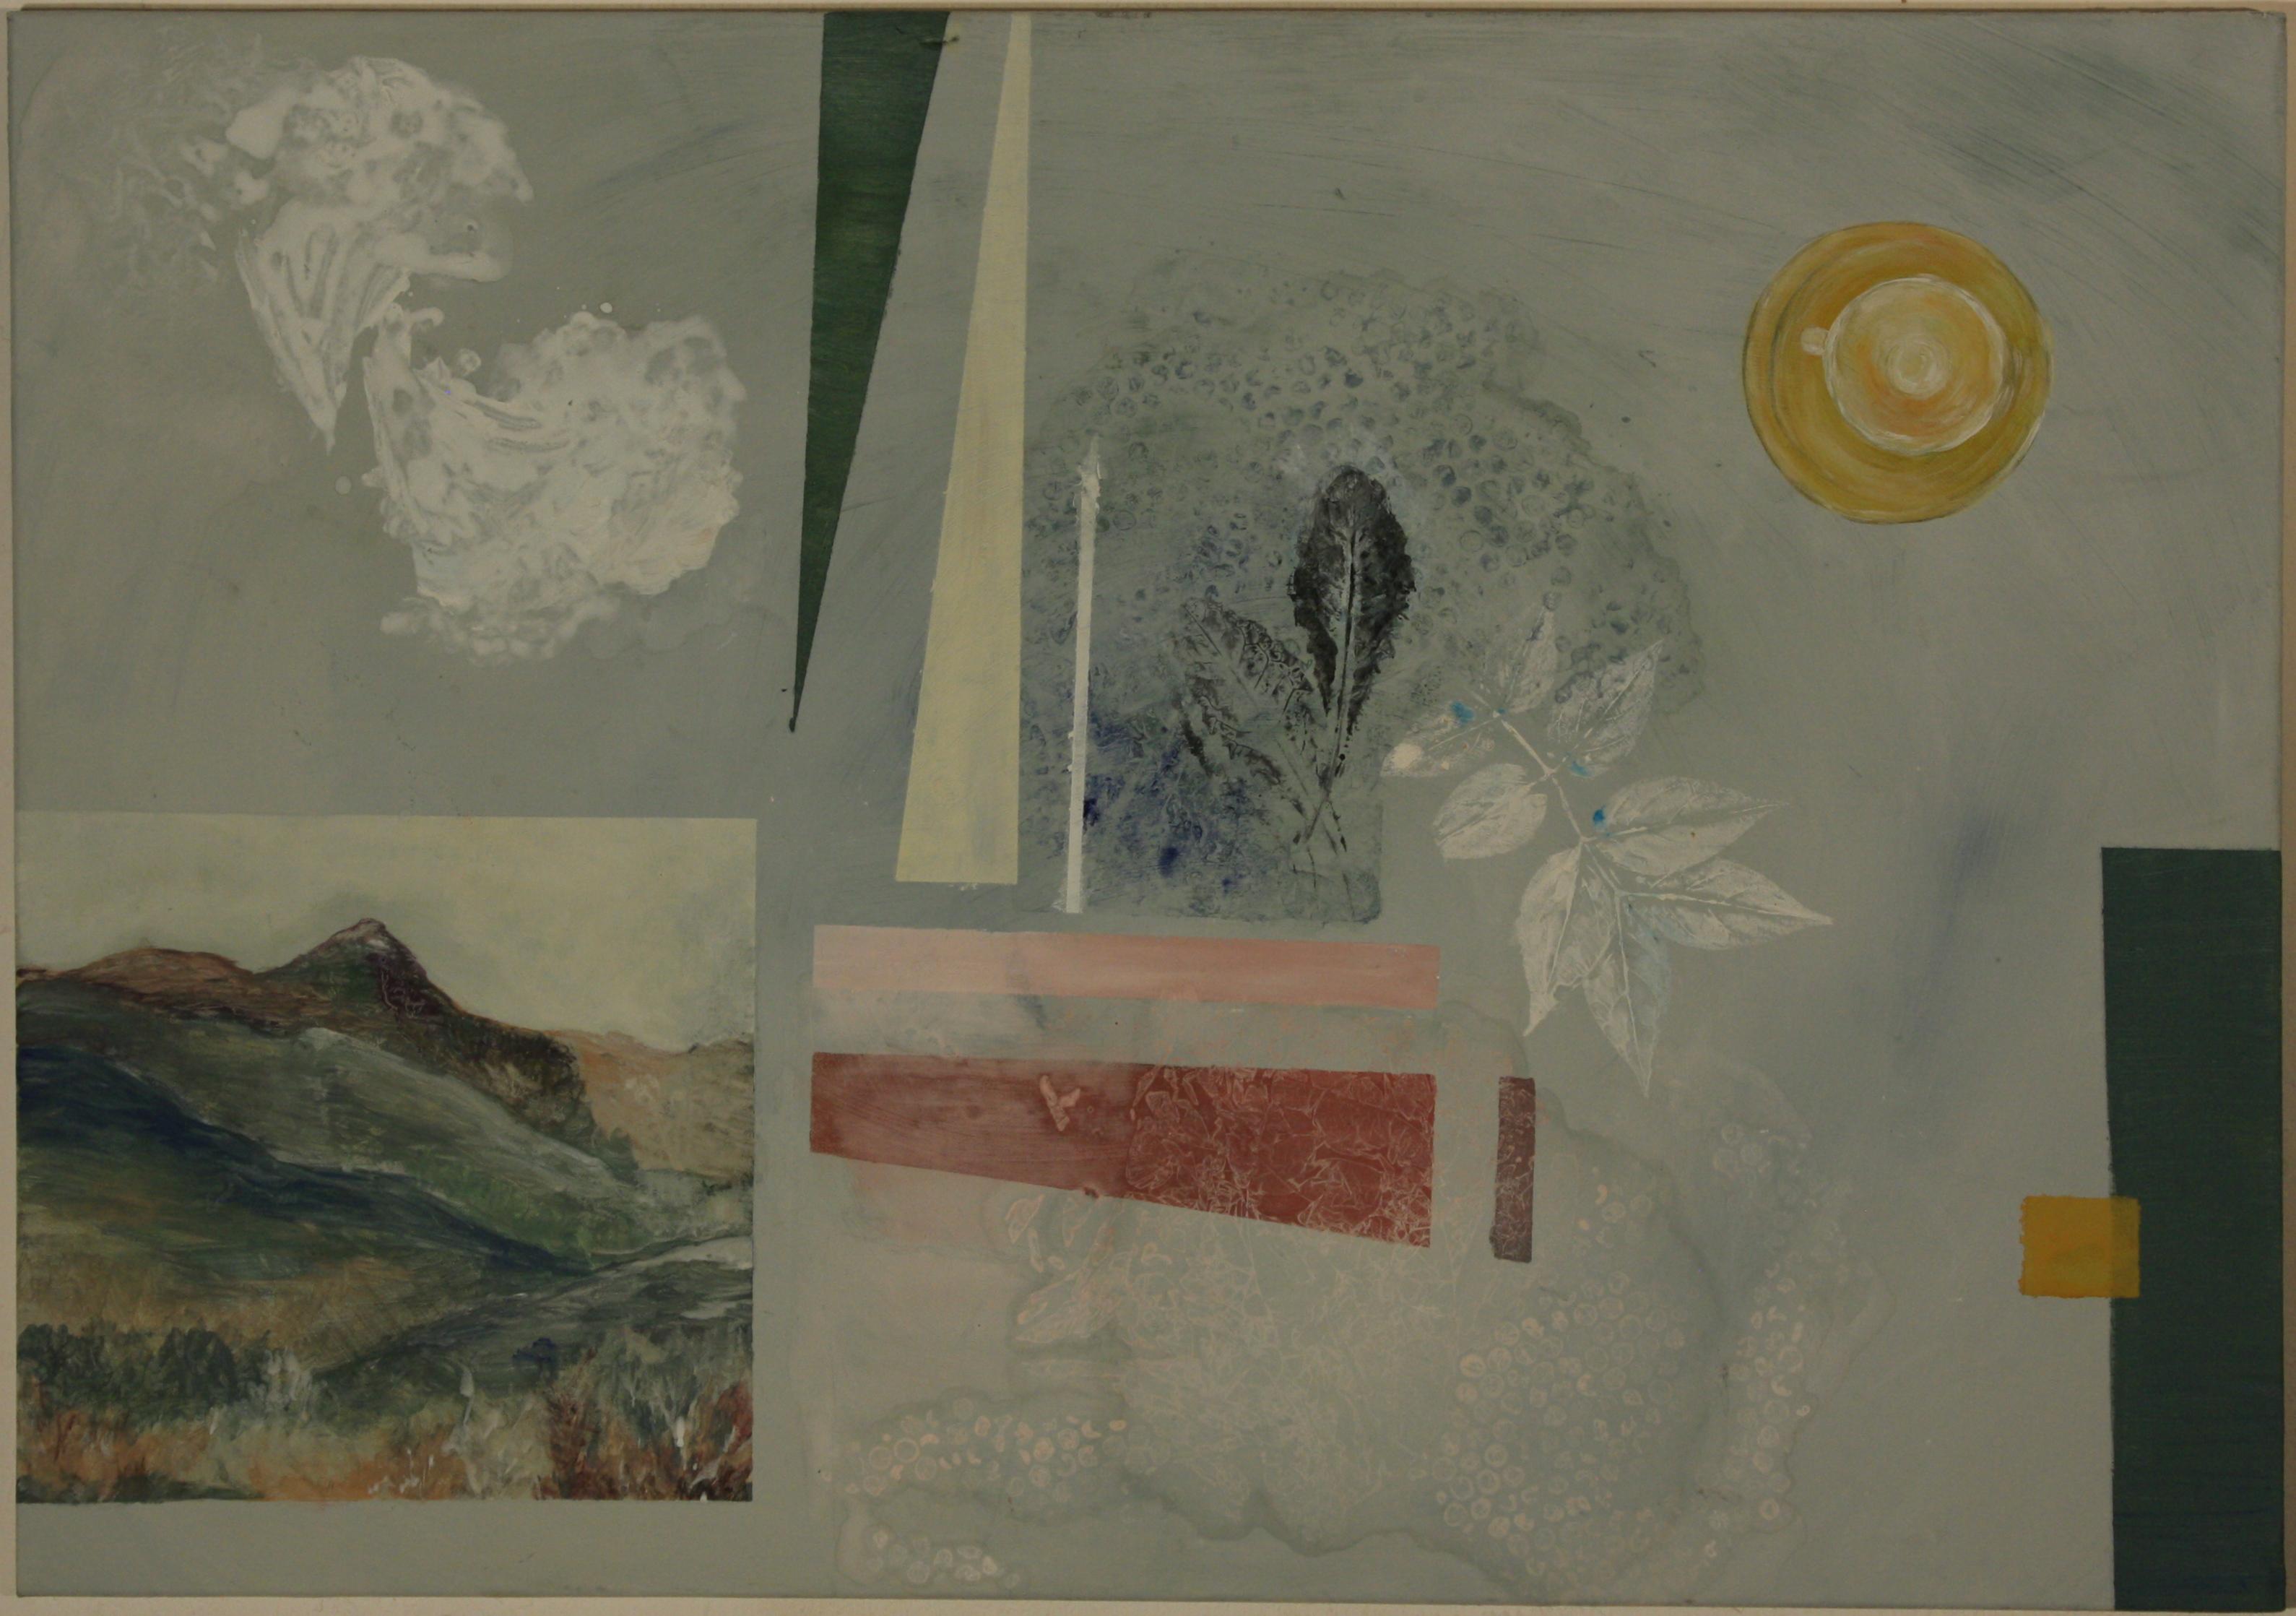 Mountainleafcoffee, eggtempera on canvas, 60 x 90 cm